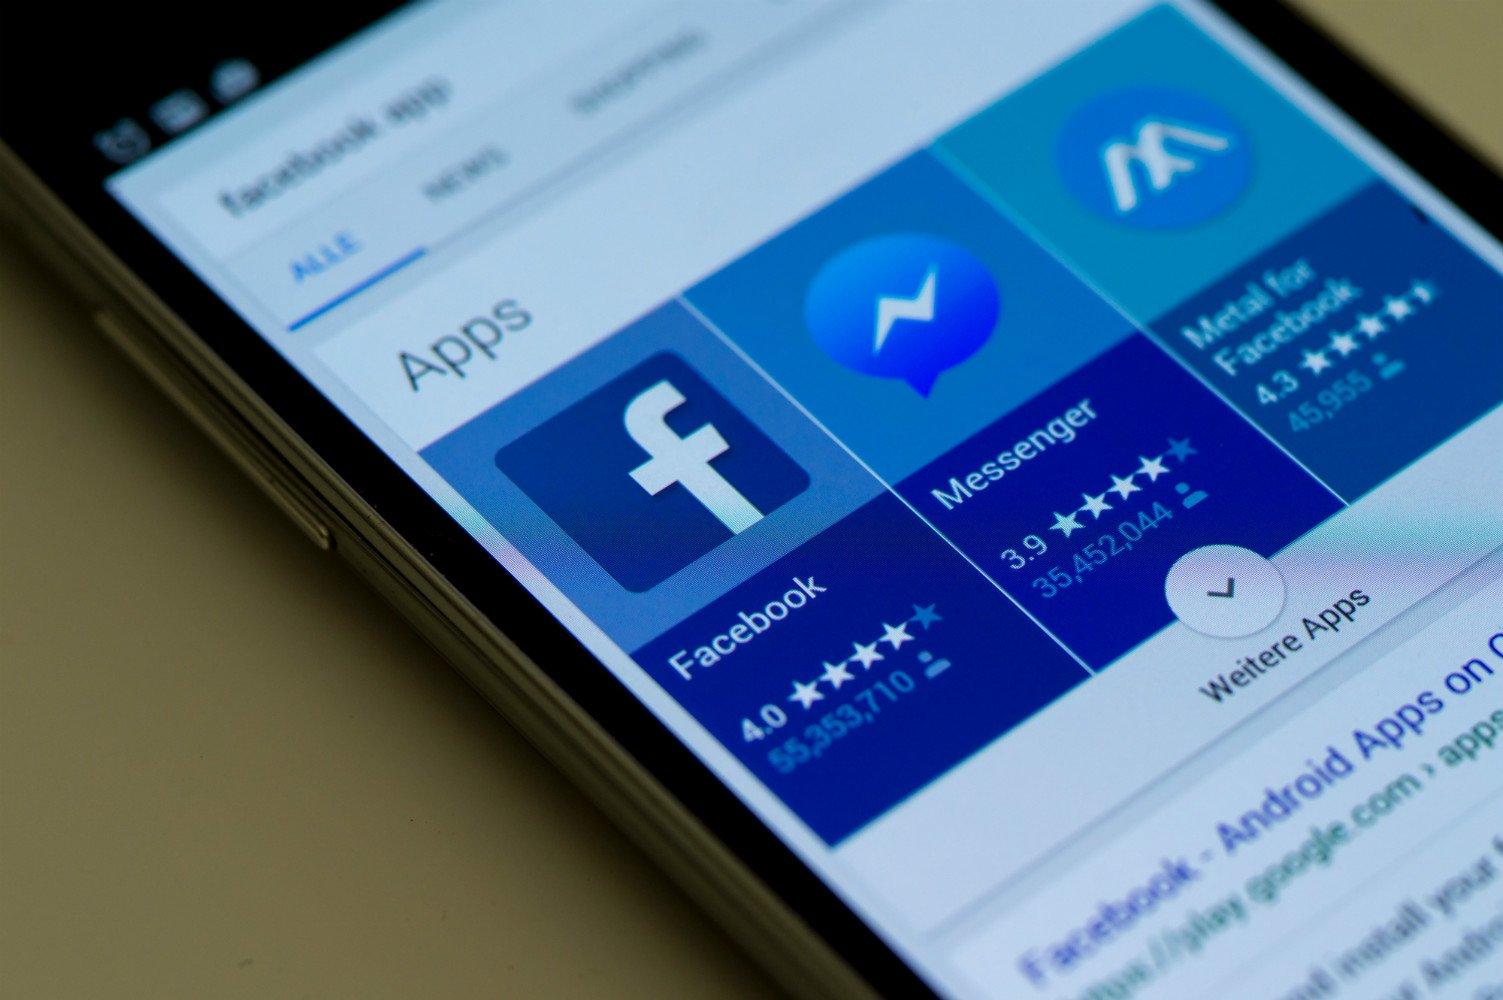 Facebook,Huawei,Trung Quốc,Bảo mật